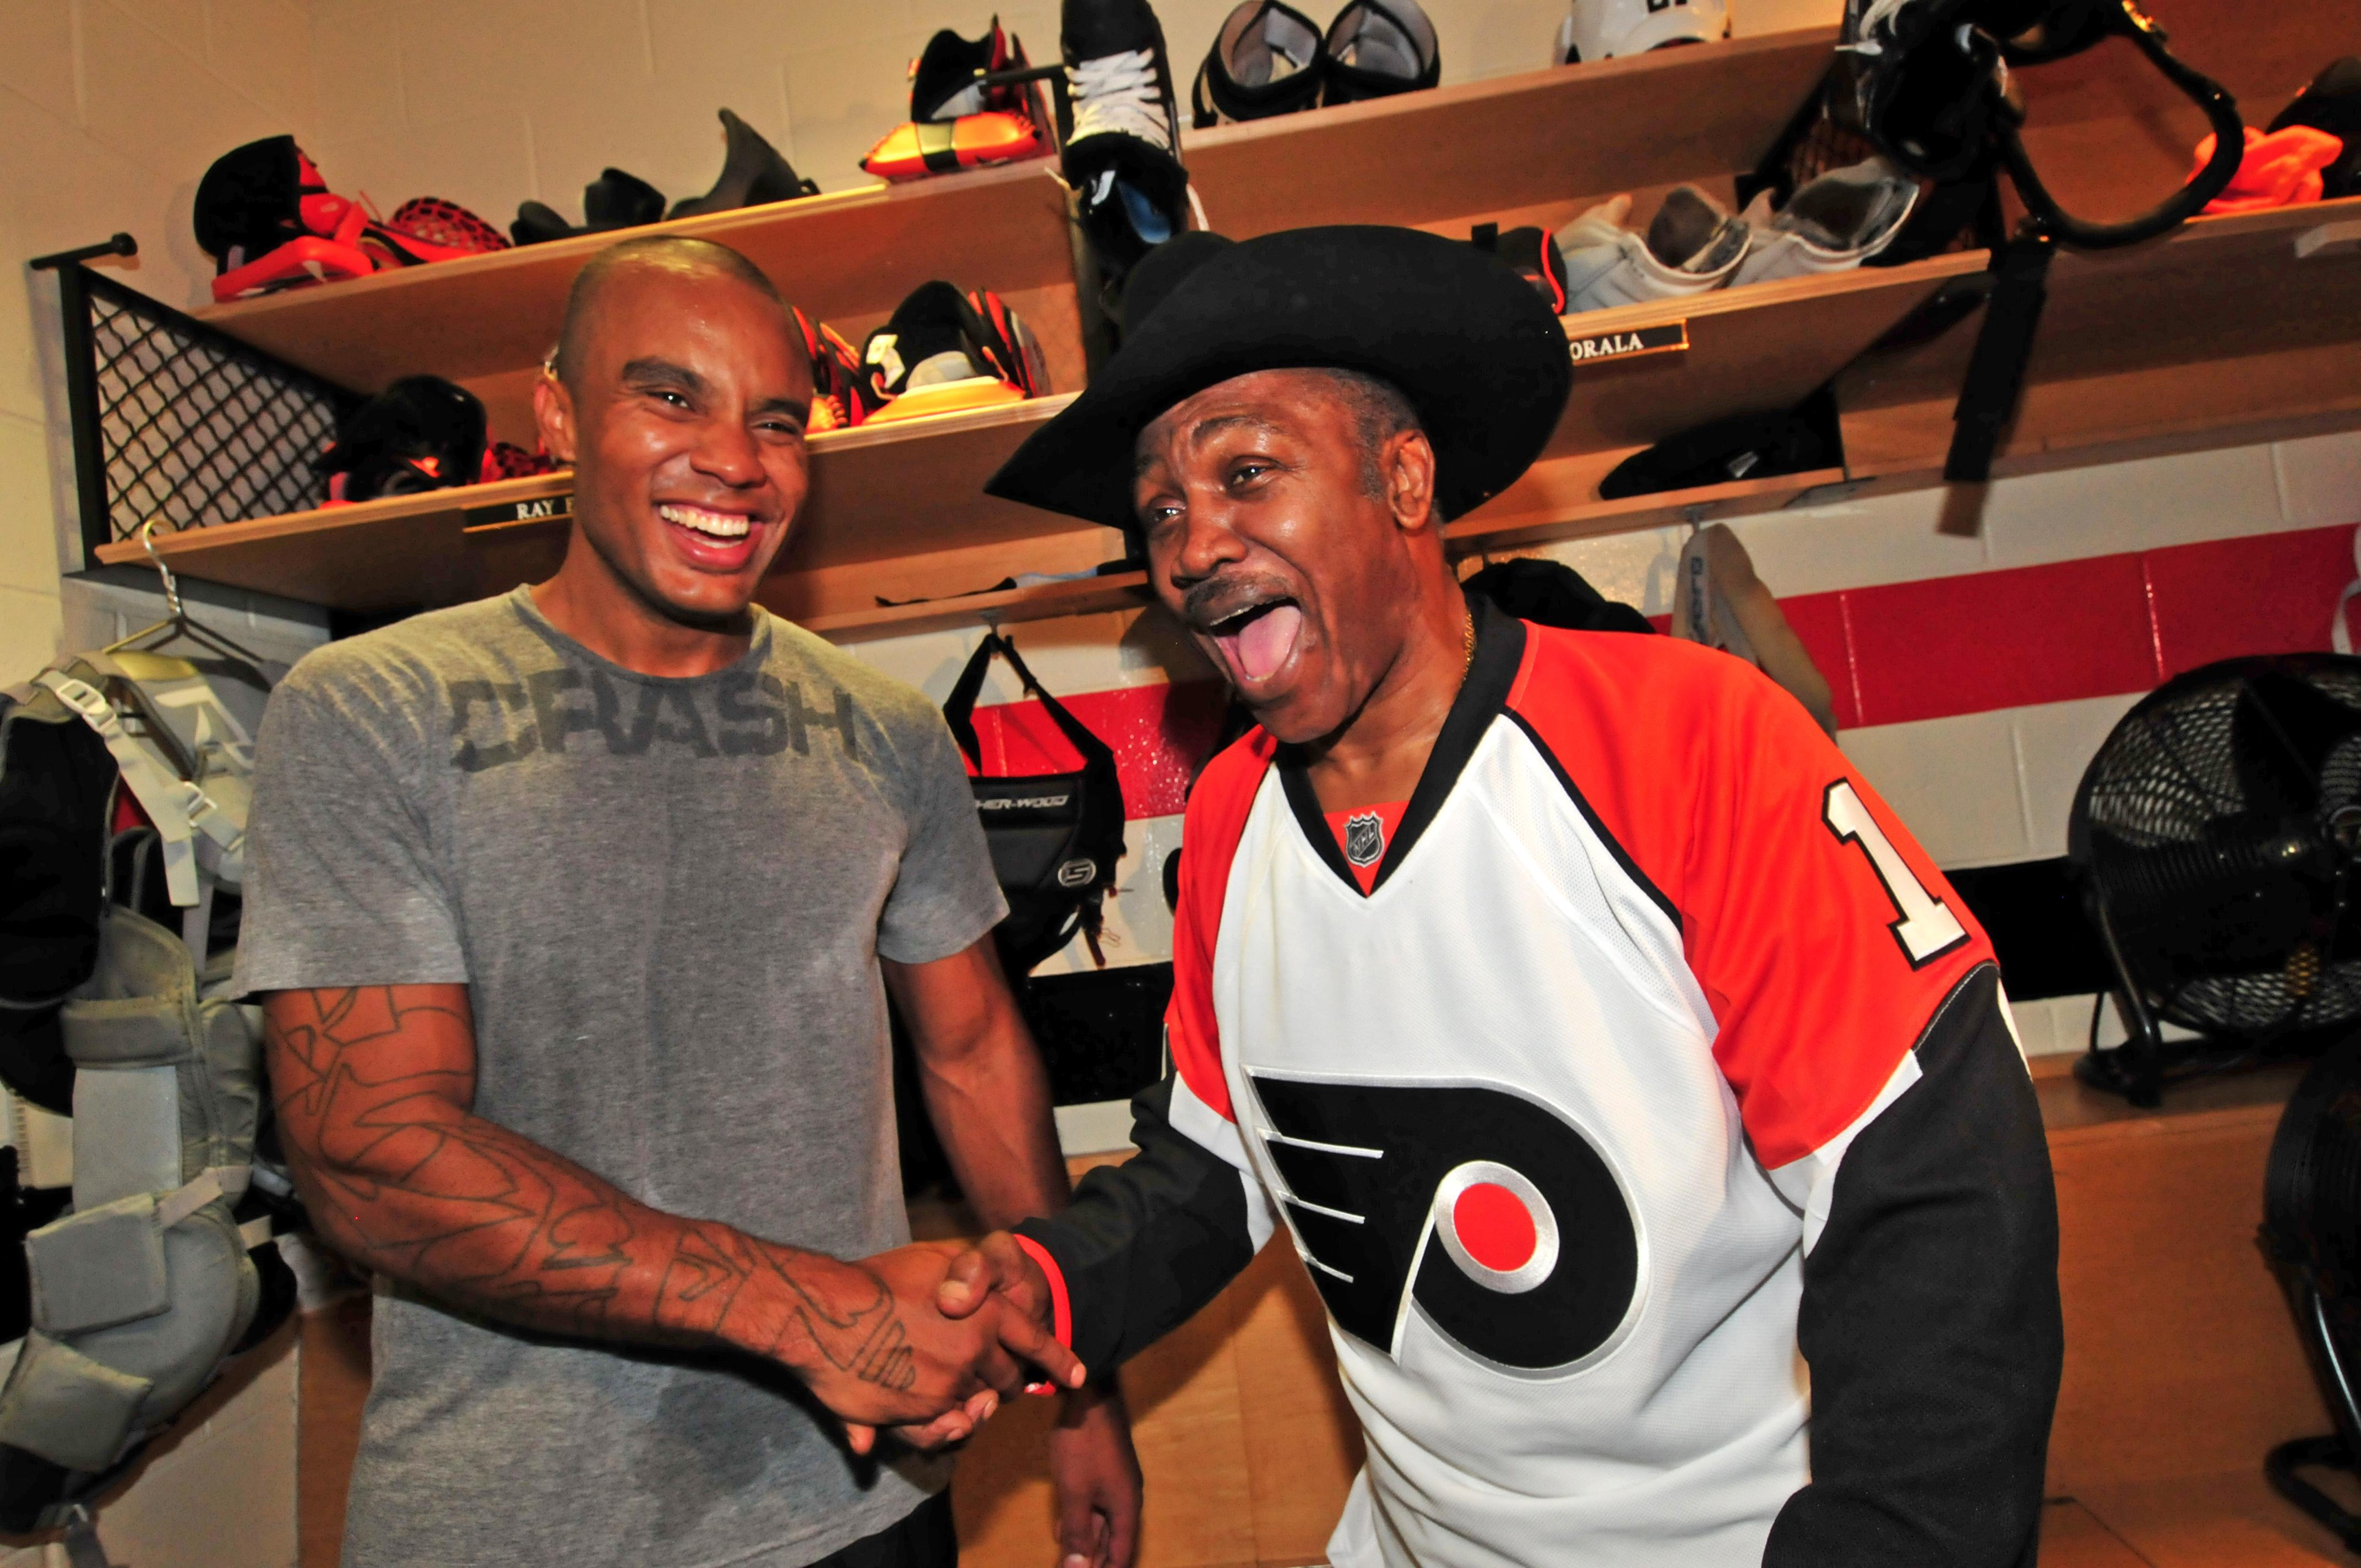 Philadelphia Flyers Ray Emery/Champ Joe Frazier